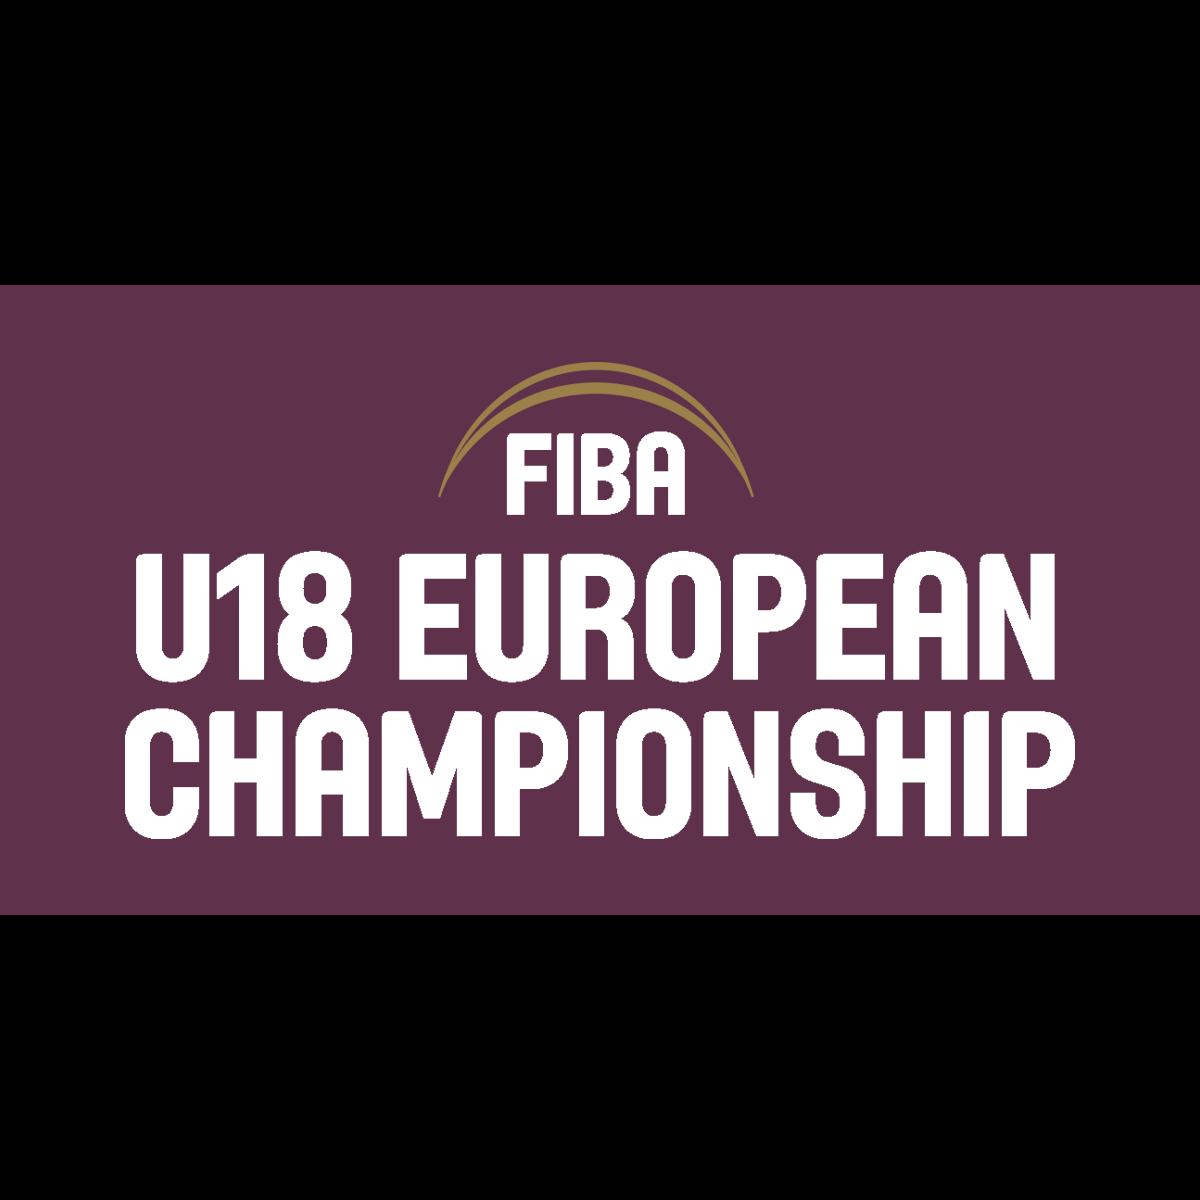 2016 FIBA U18 European Basketball Championship